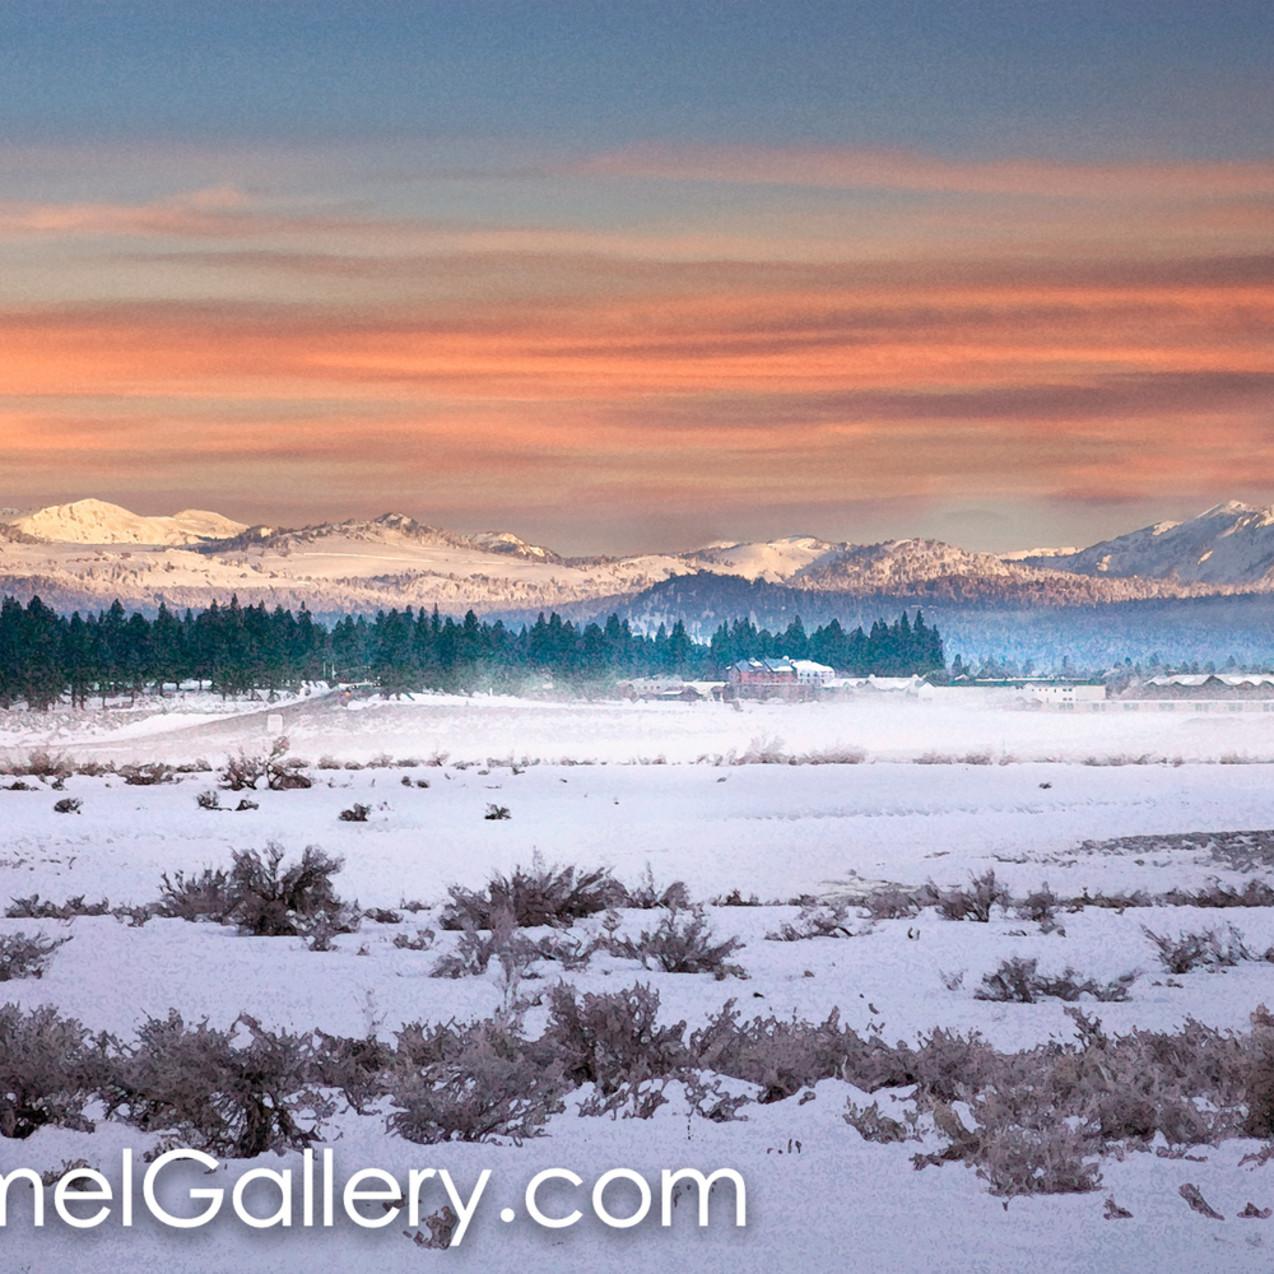 Winter sunrise martis valley gdyobp